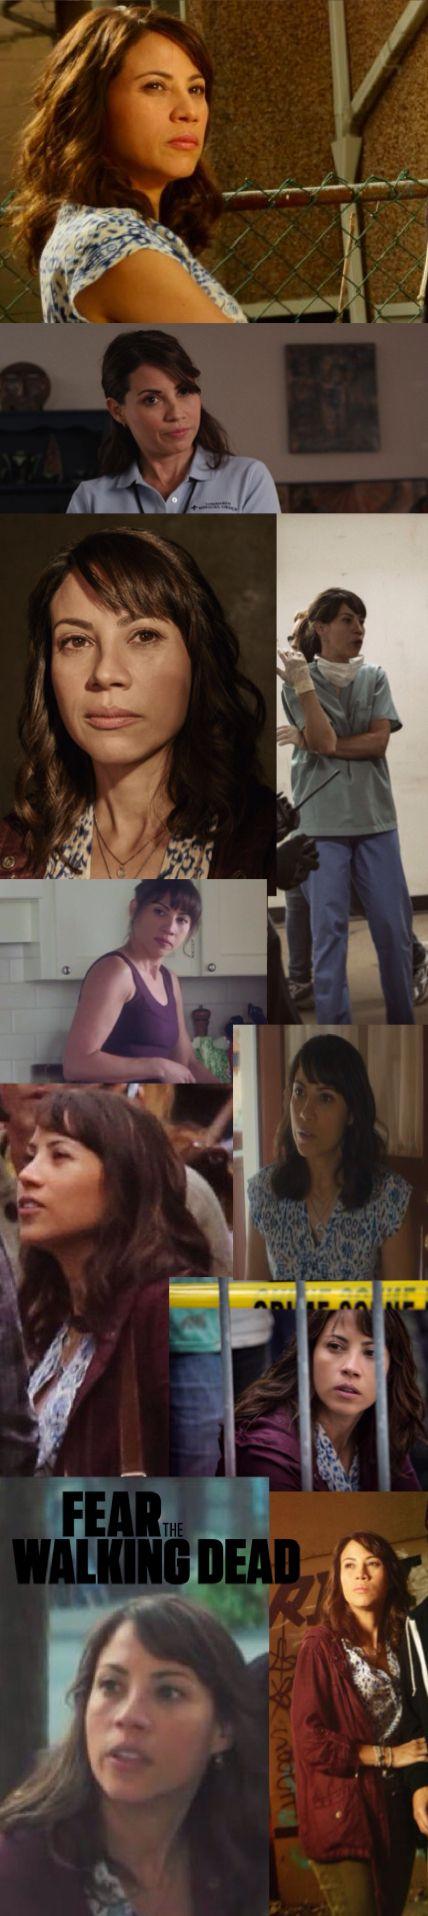 Liza Ortiz played by Elizabeth Rodriguez